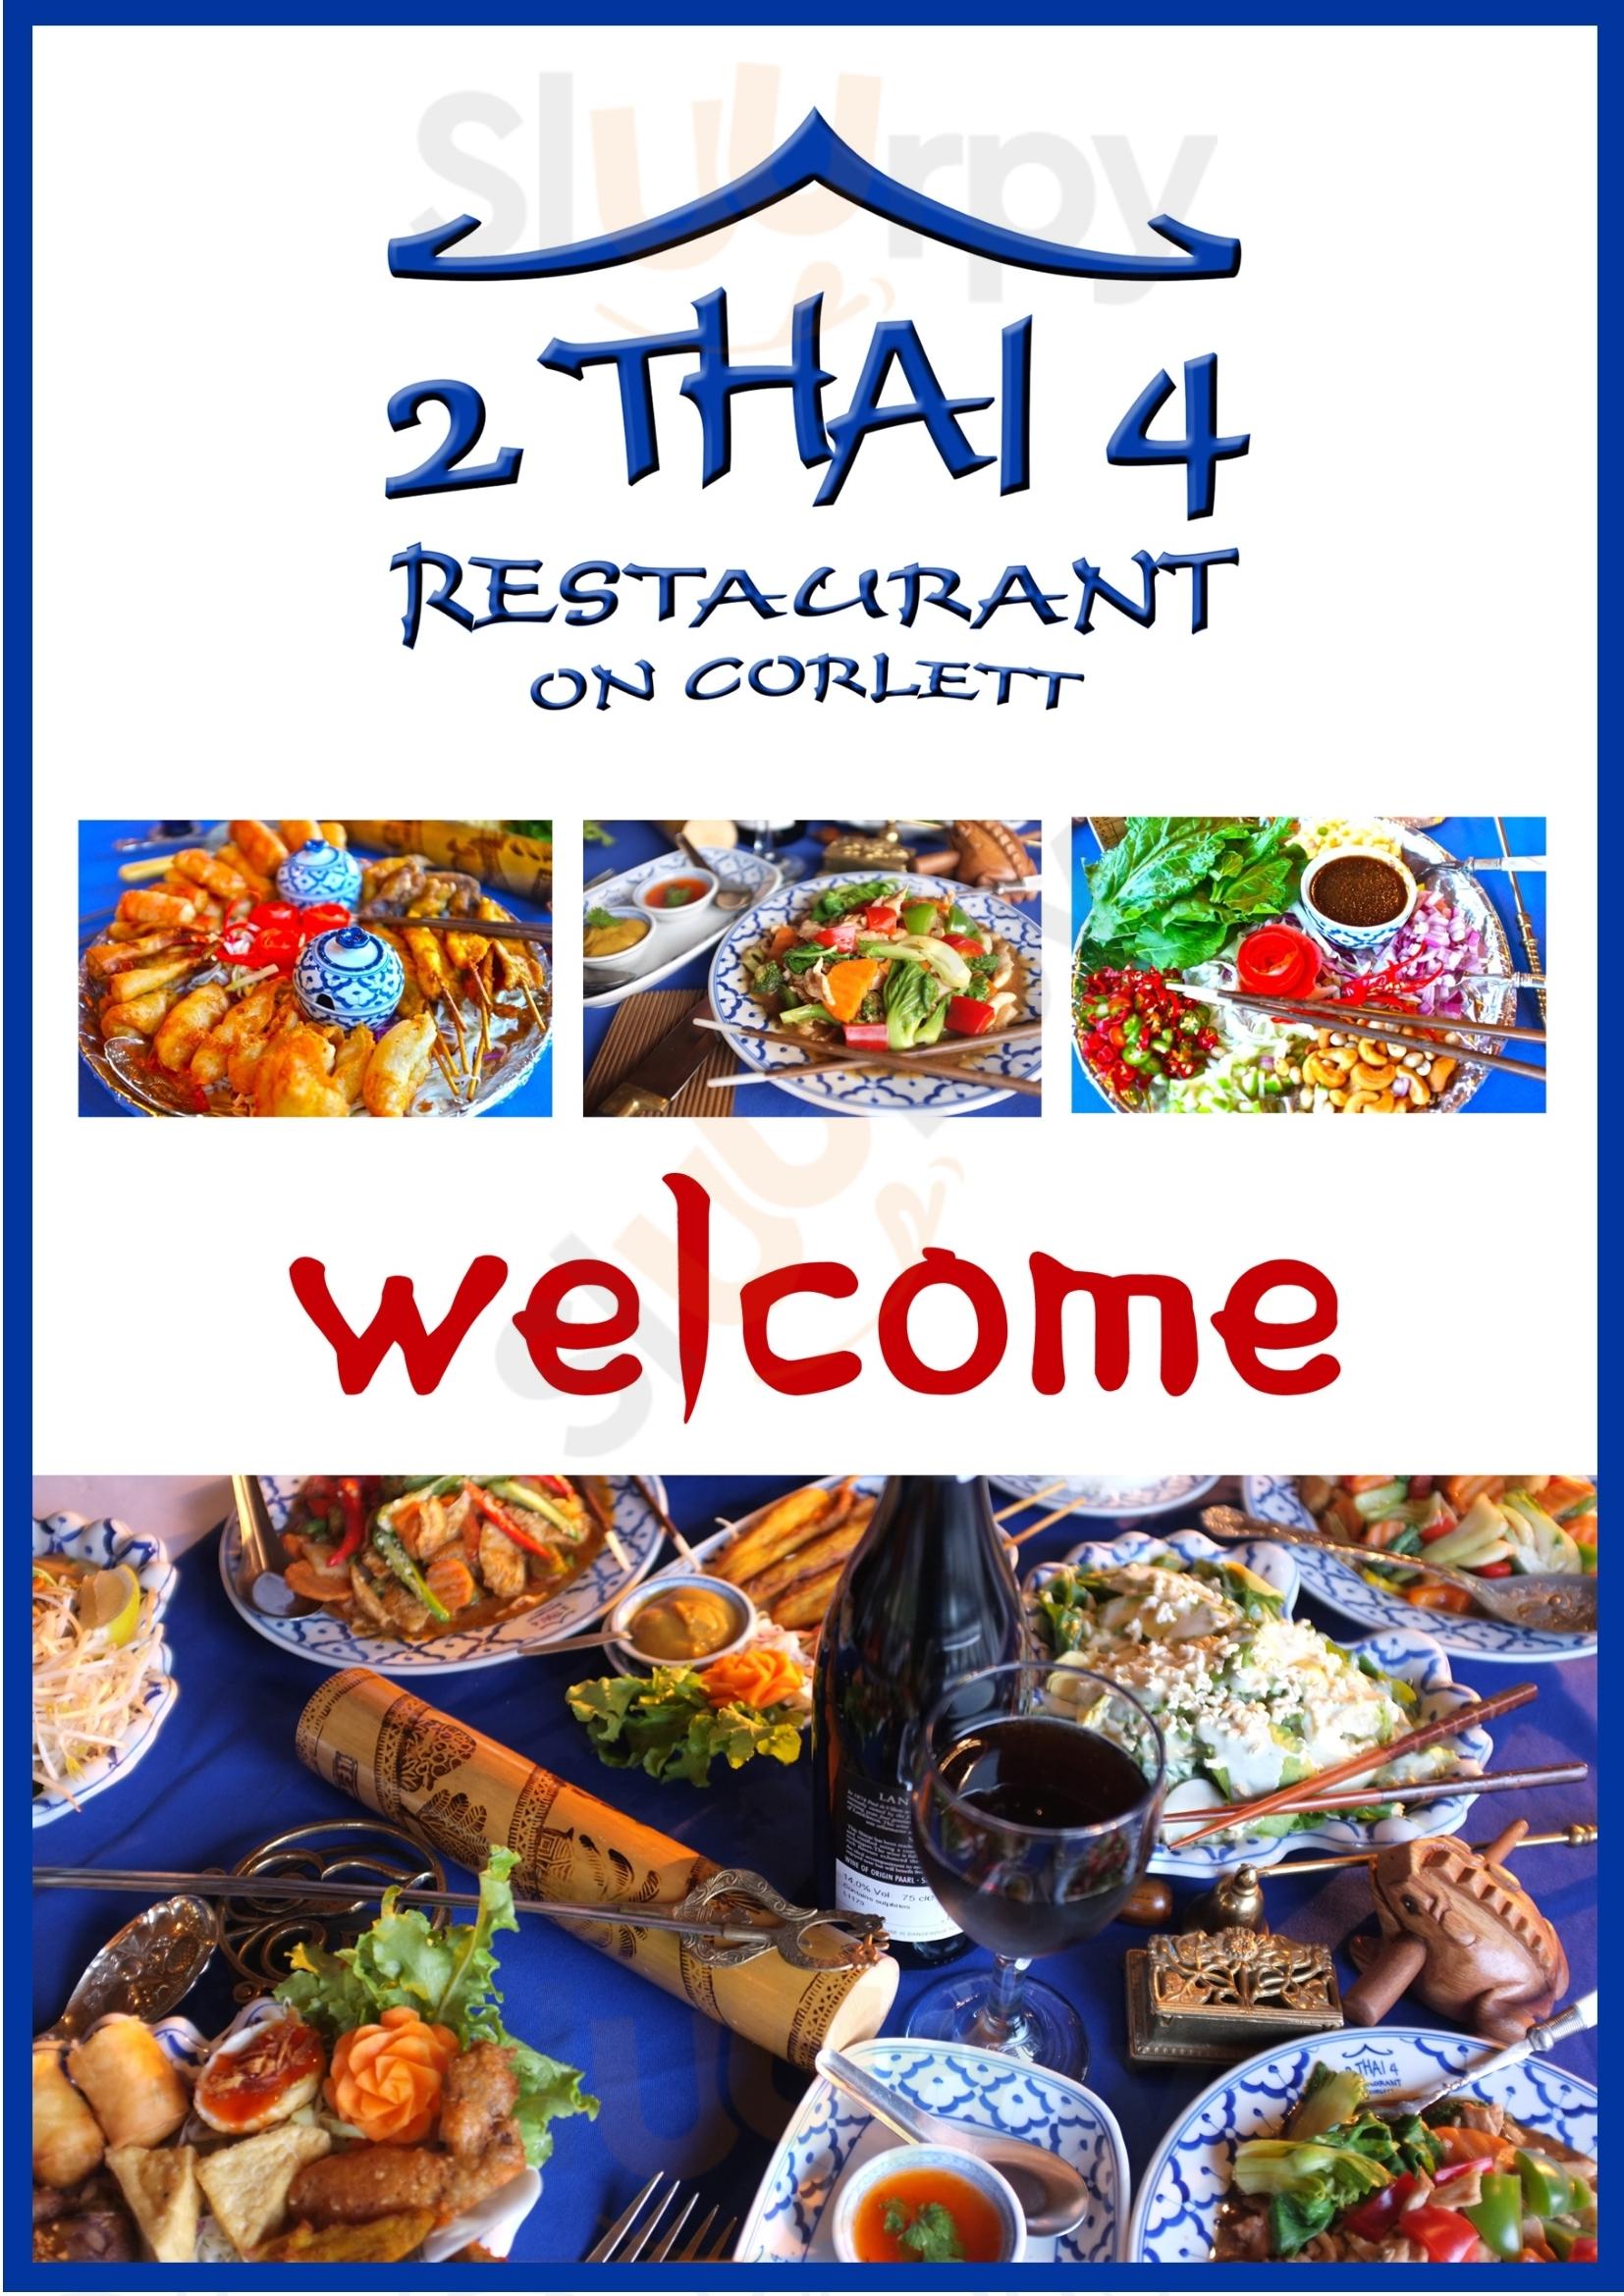 2 Thai 4 Restaurant Johannesburg Menu - 1